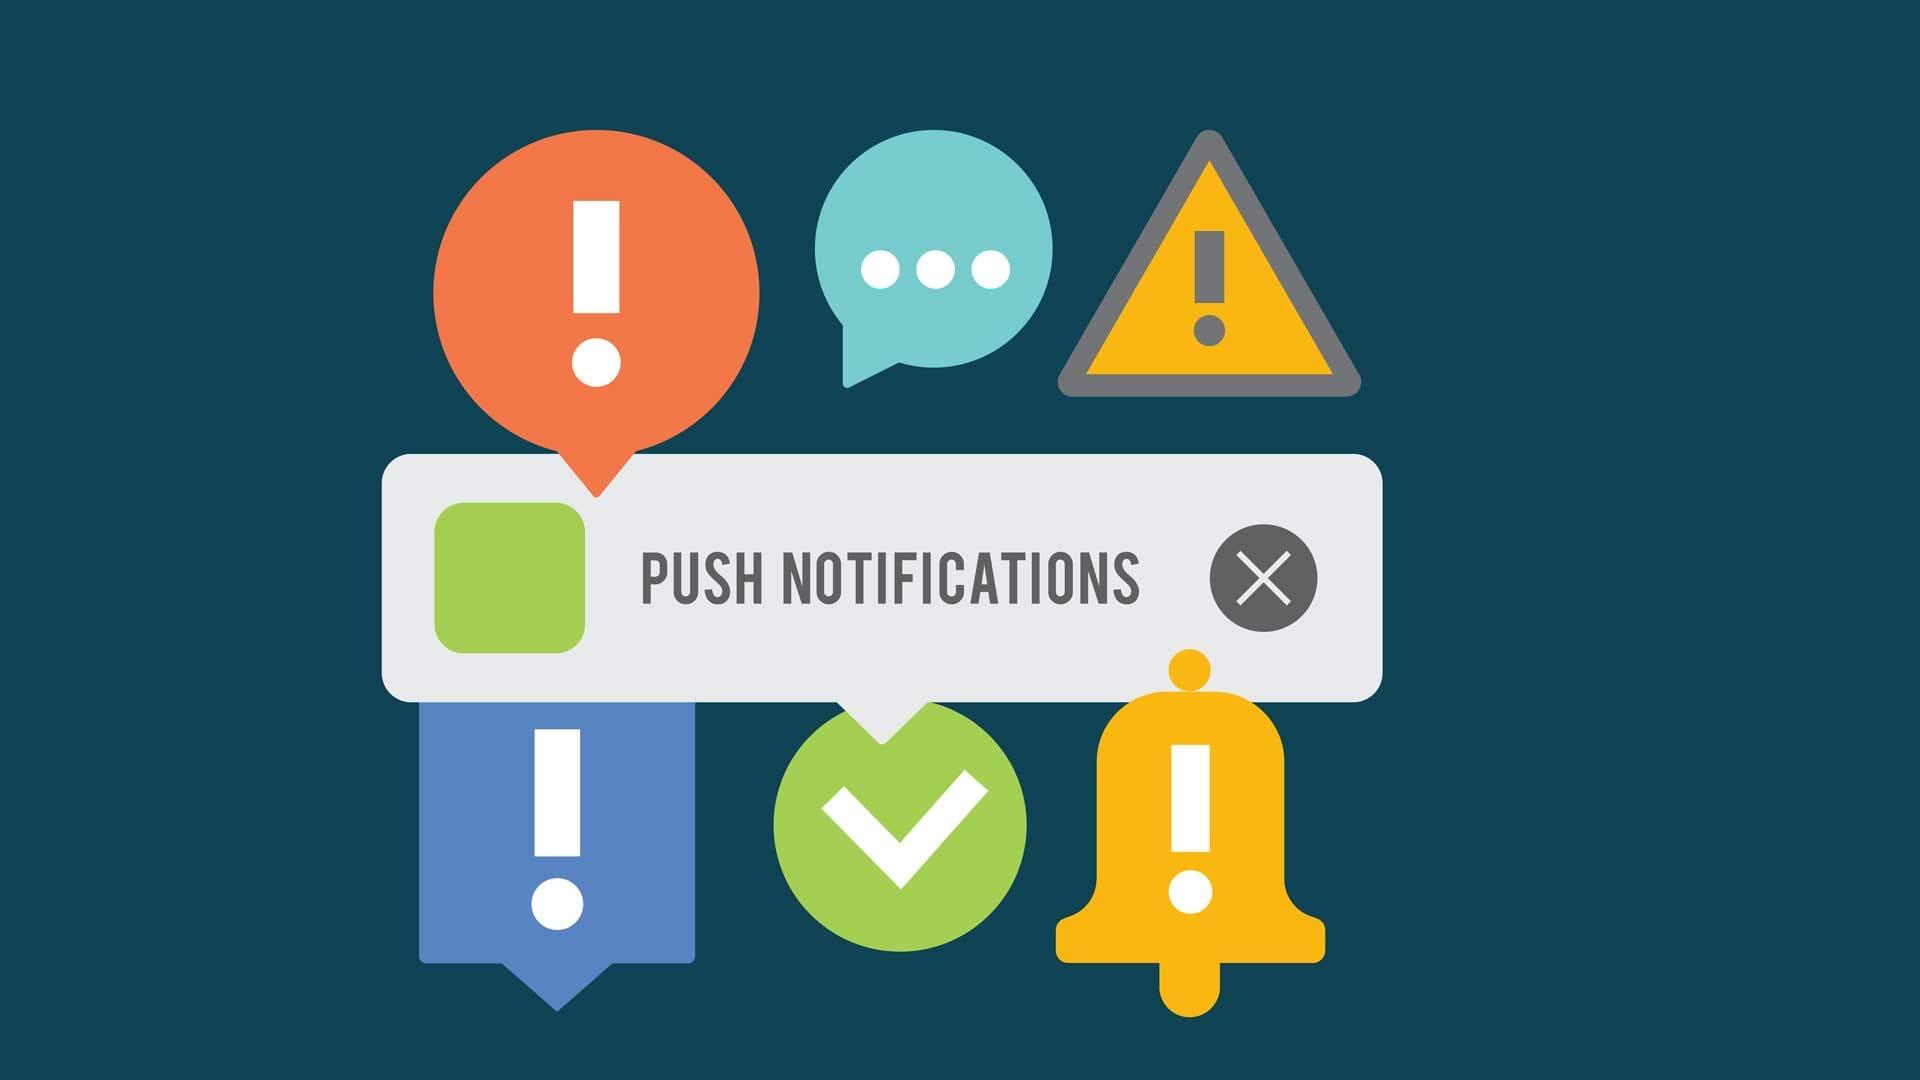 https://www.ducem.in/wp-content/uploads/2021/07/mobile-push-notifications-ss-1920.jpg